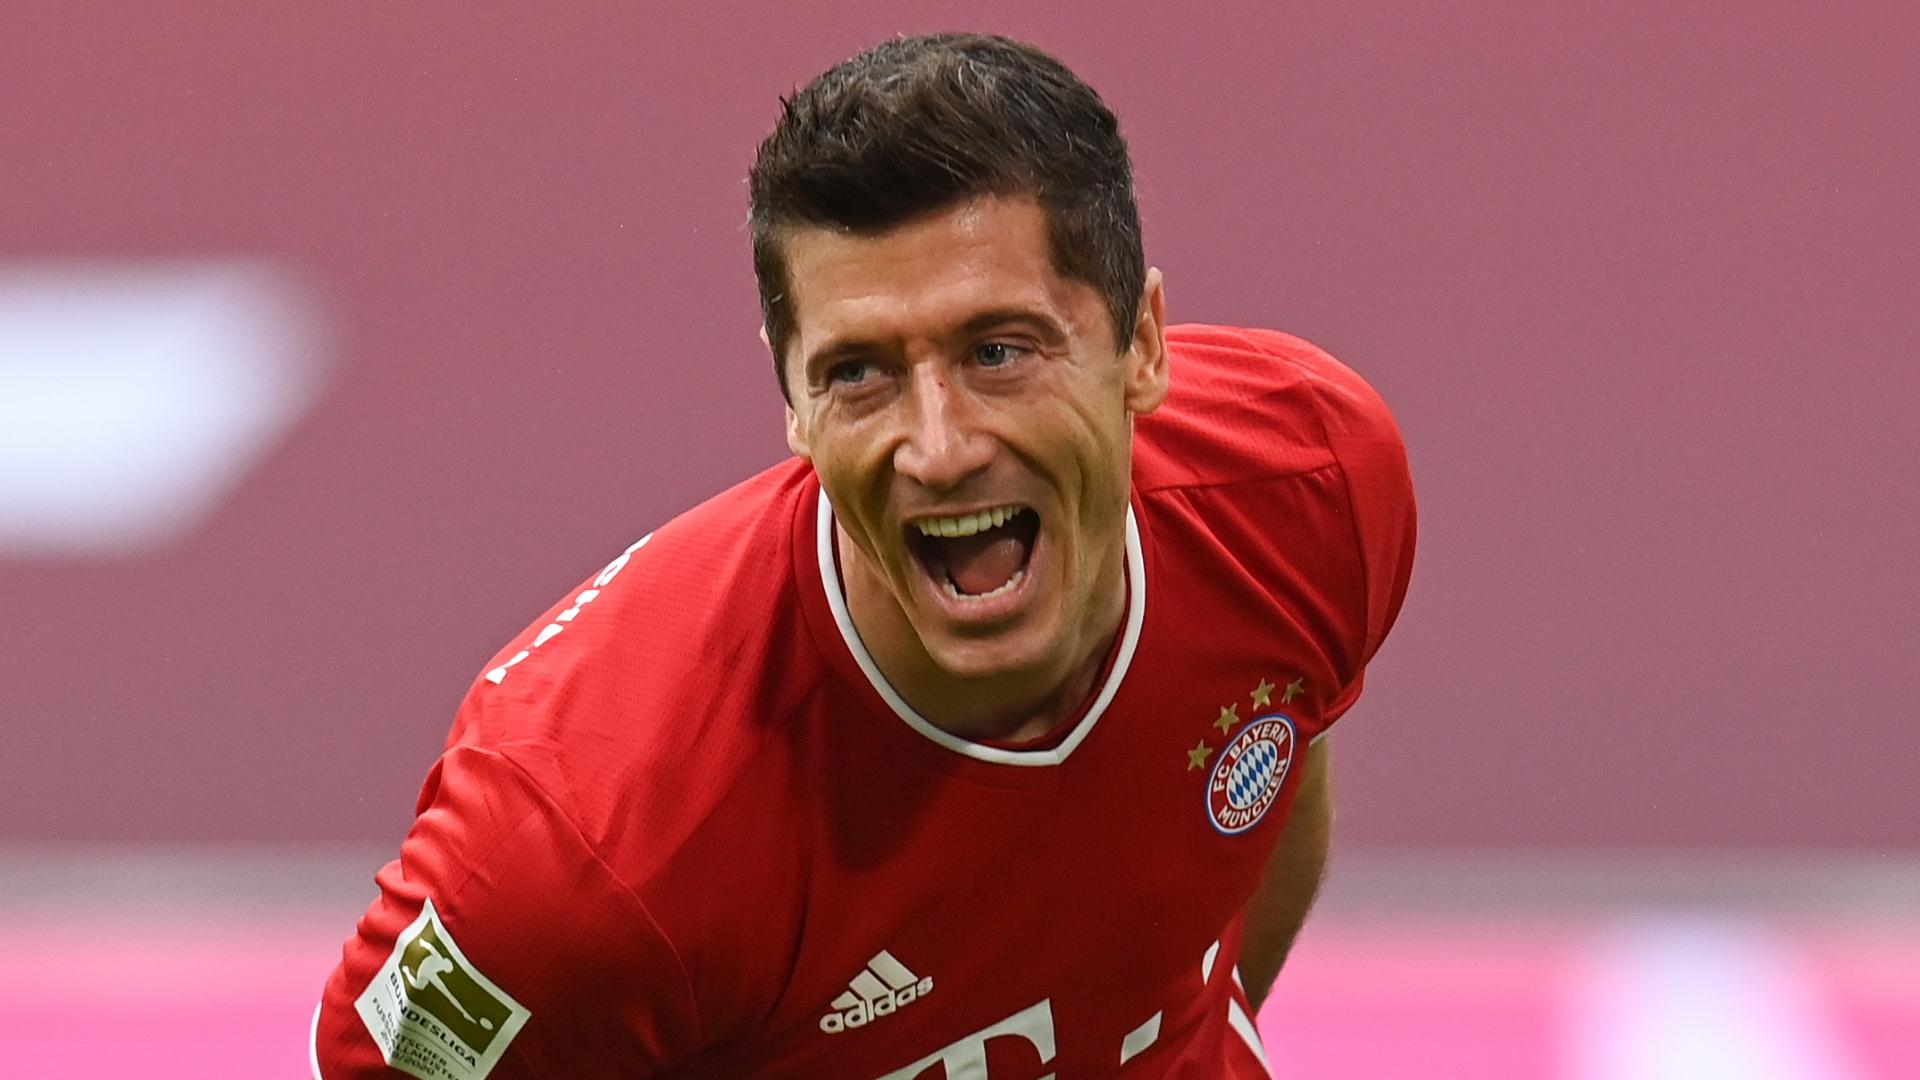 Lewandowski reaches another goal-scoring milestone with Bundesliga strike in Bayern Munich win